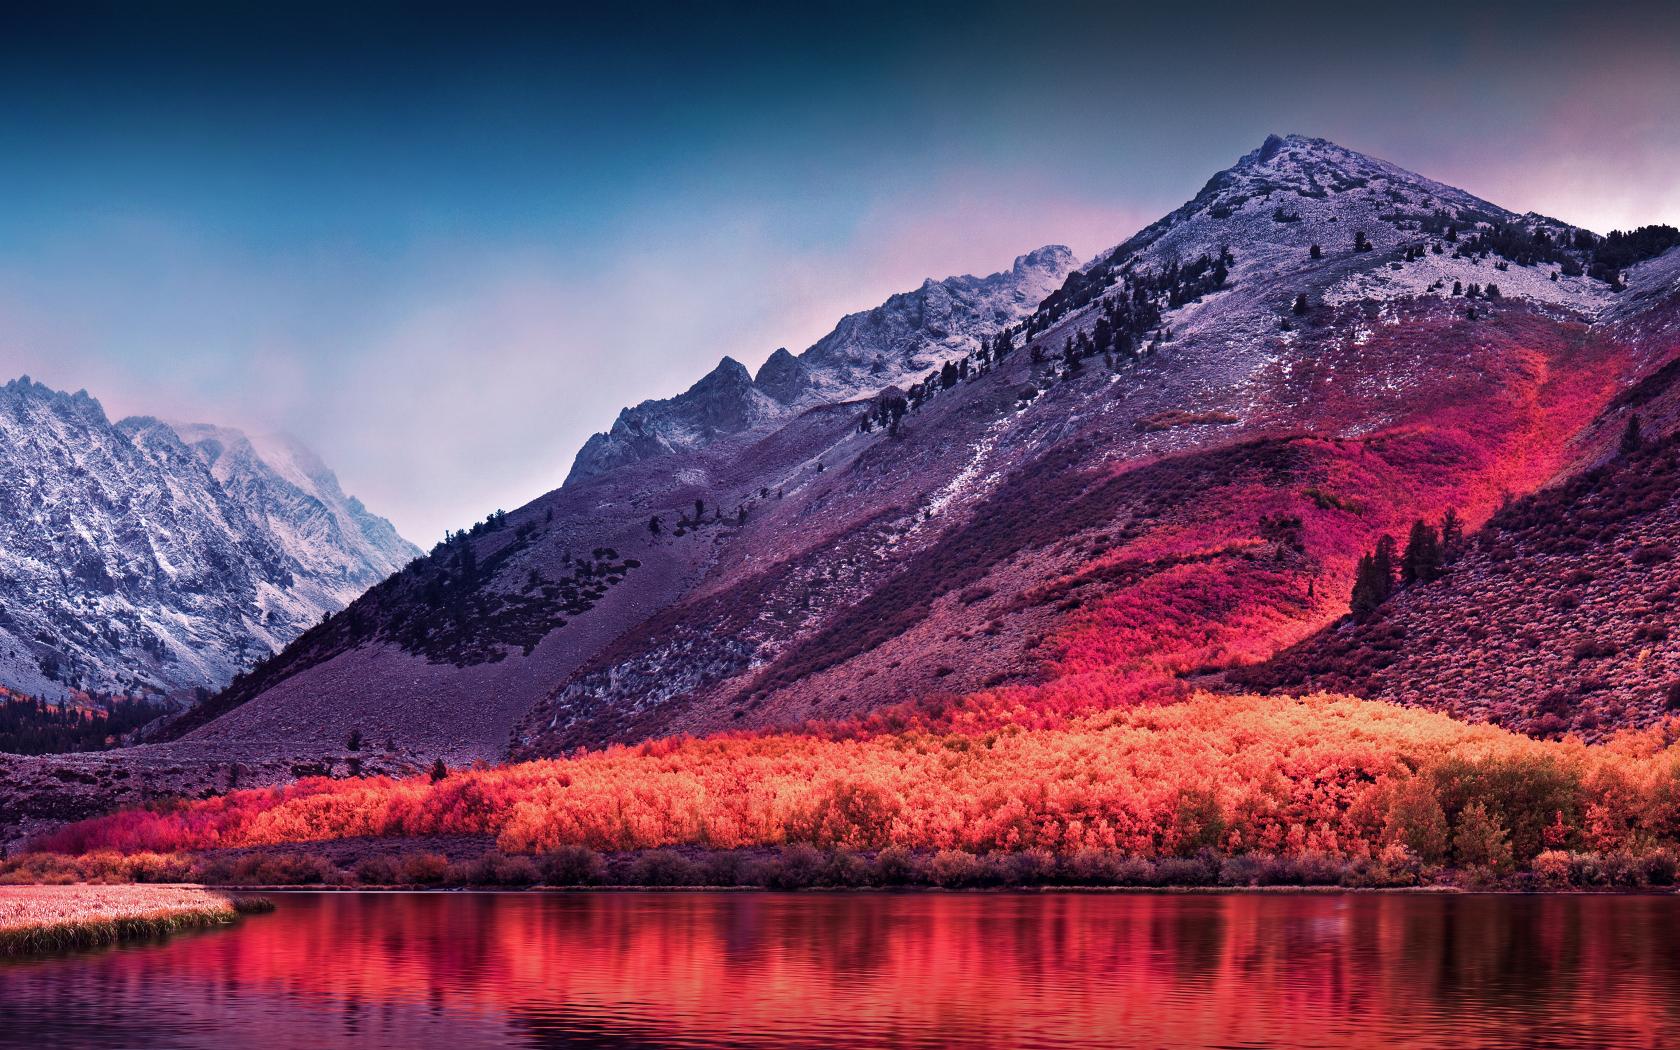 Nature Stock From Macos Sierra Hd 4k Wallpaper